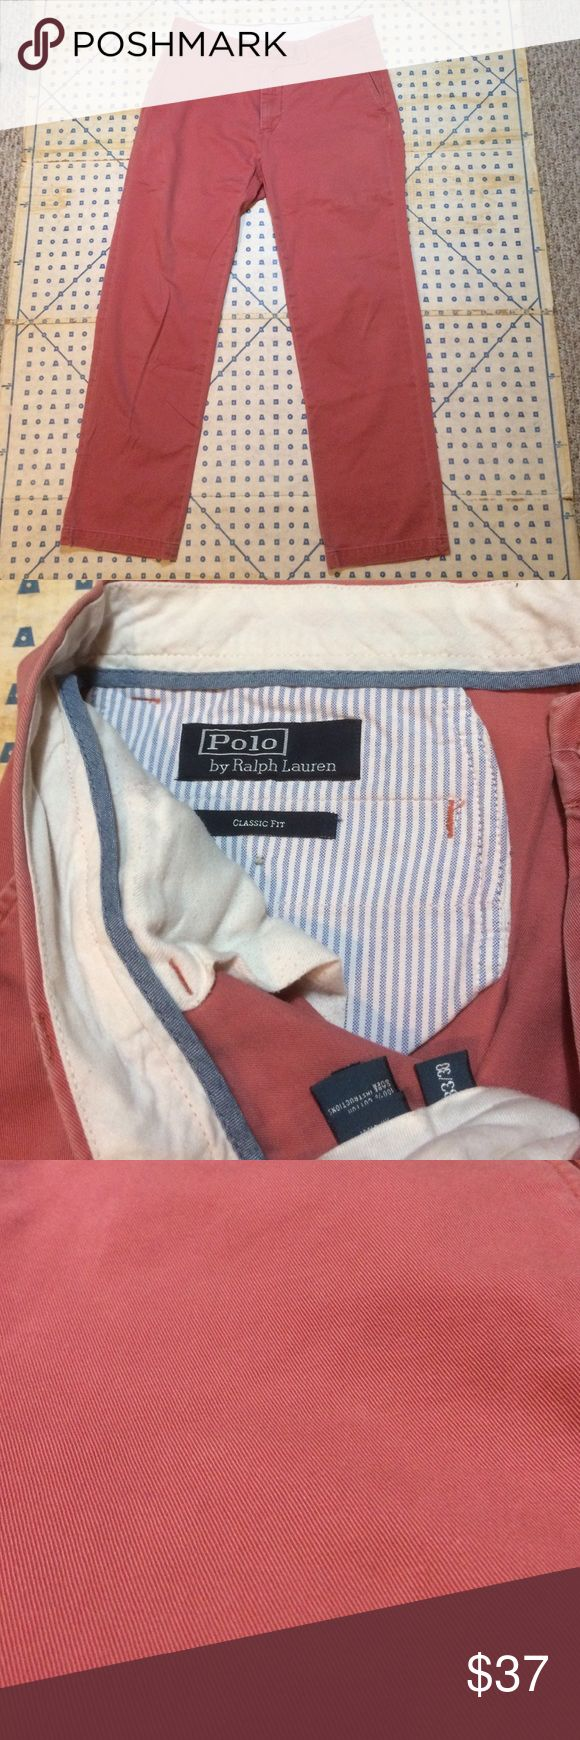 Best 25+ Salmon pants ideas on Pinterest | Coral jeans outfit, Coral jeans  and Coral pants outfit